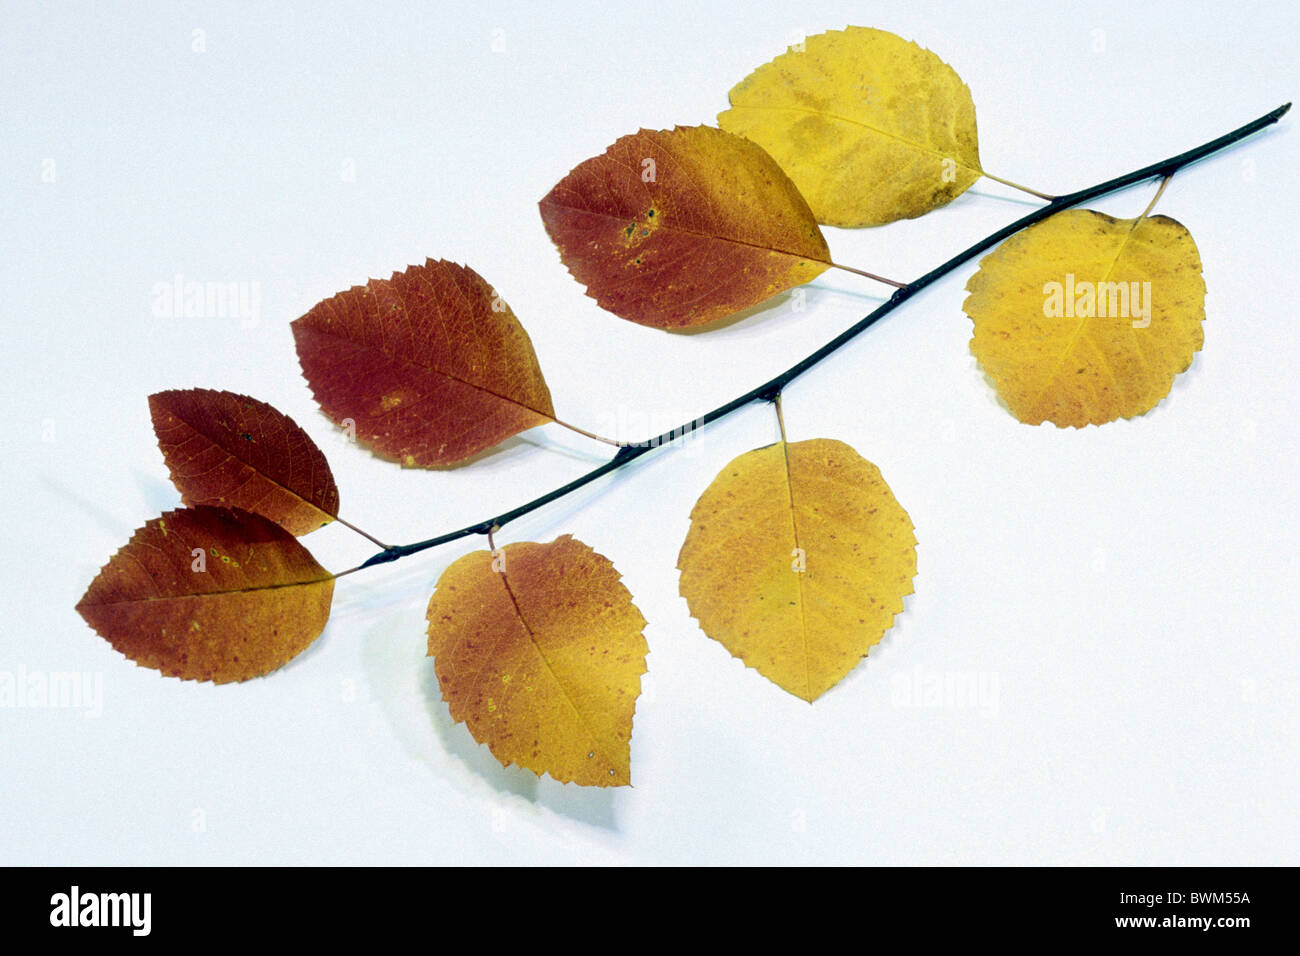 European Serviceberry, Snowy Mespillus (Amelanchier ovalis), twig with autumn leaves, studio picture. Stock Photo